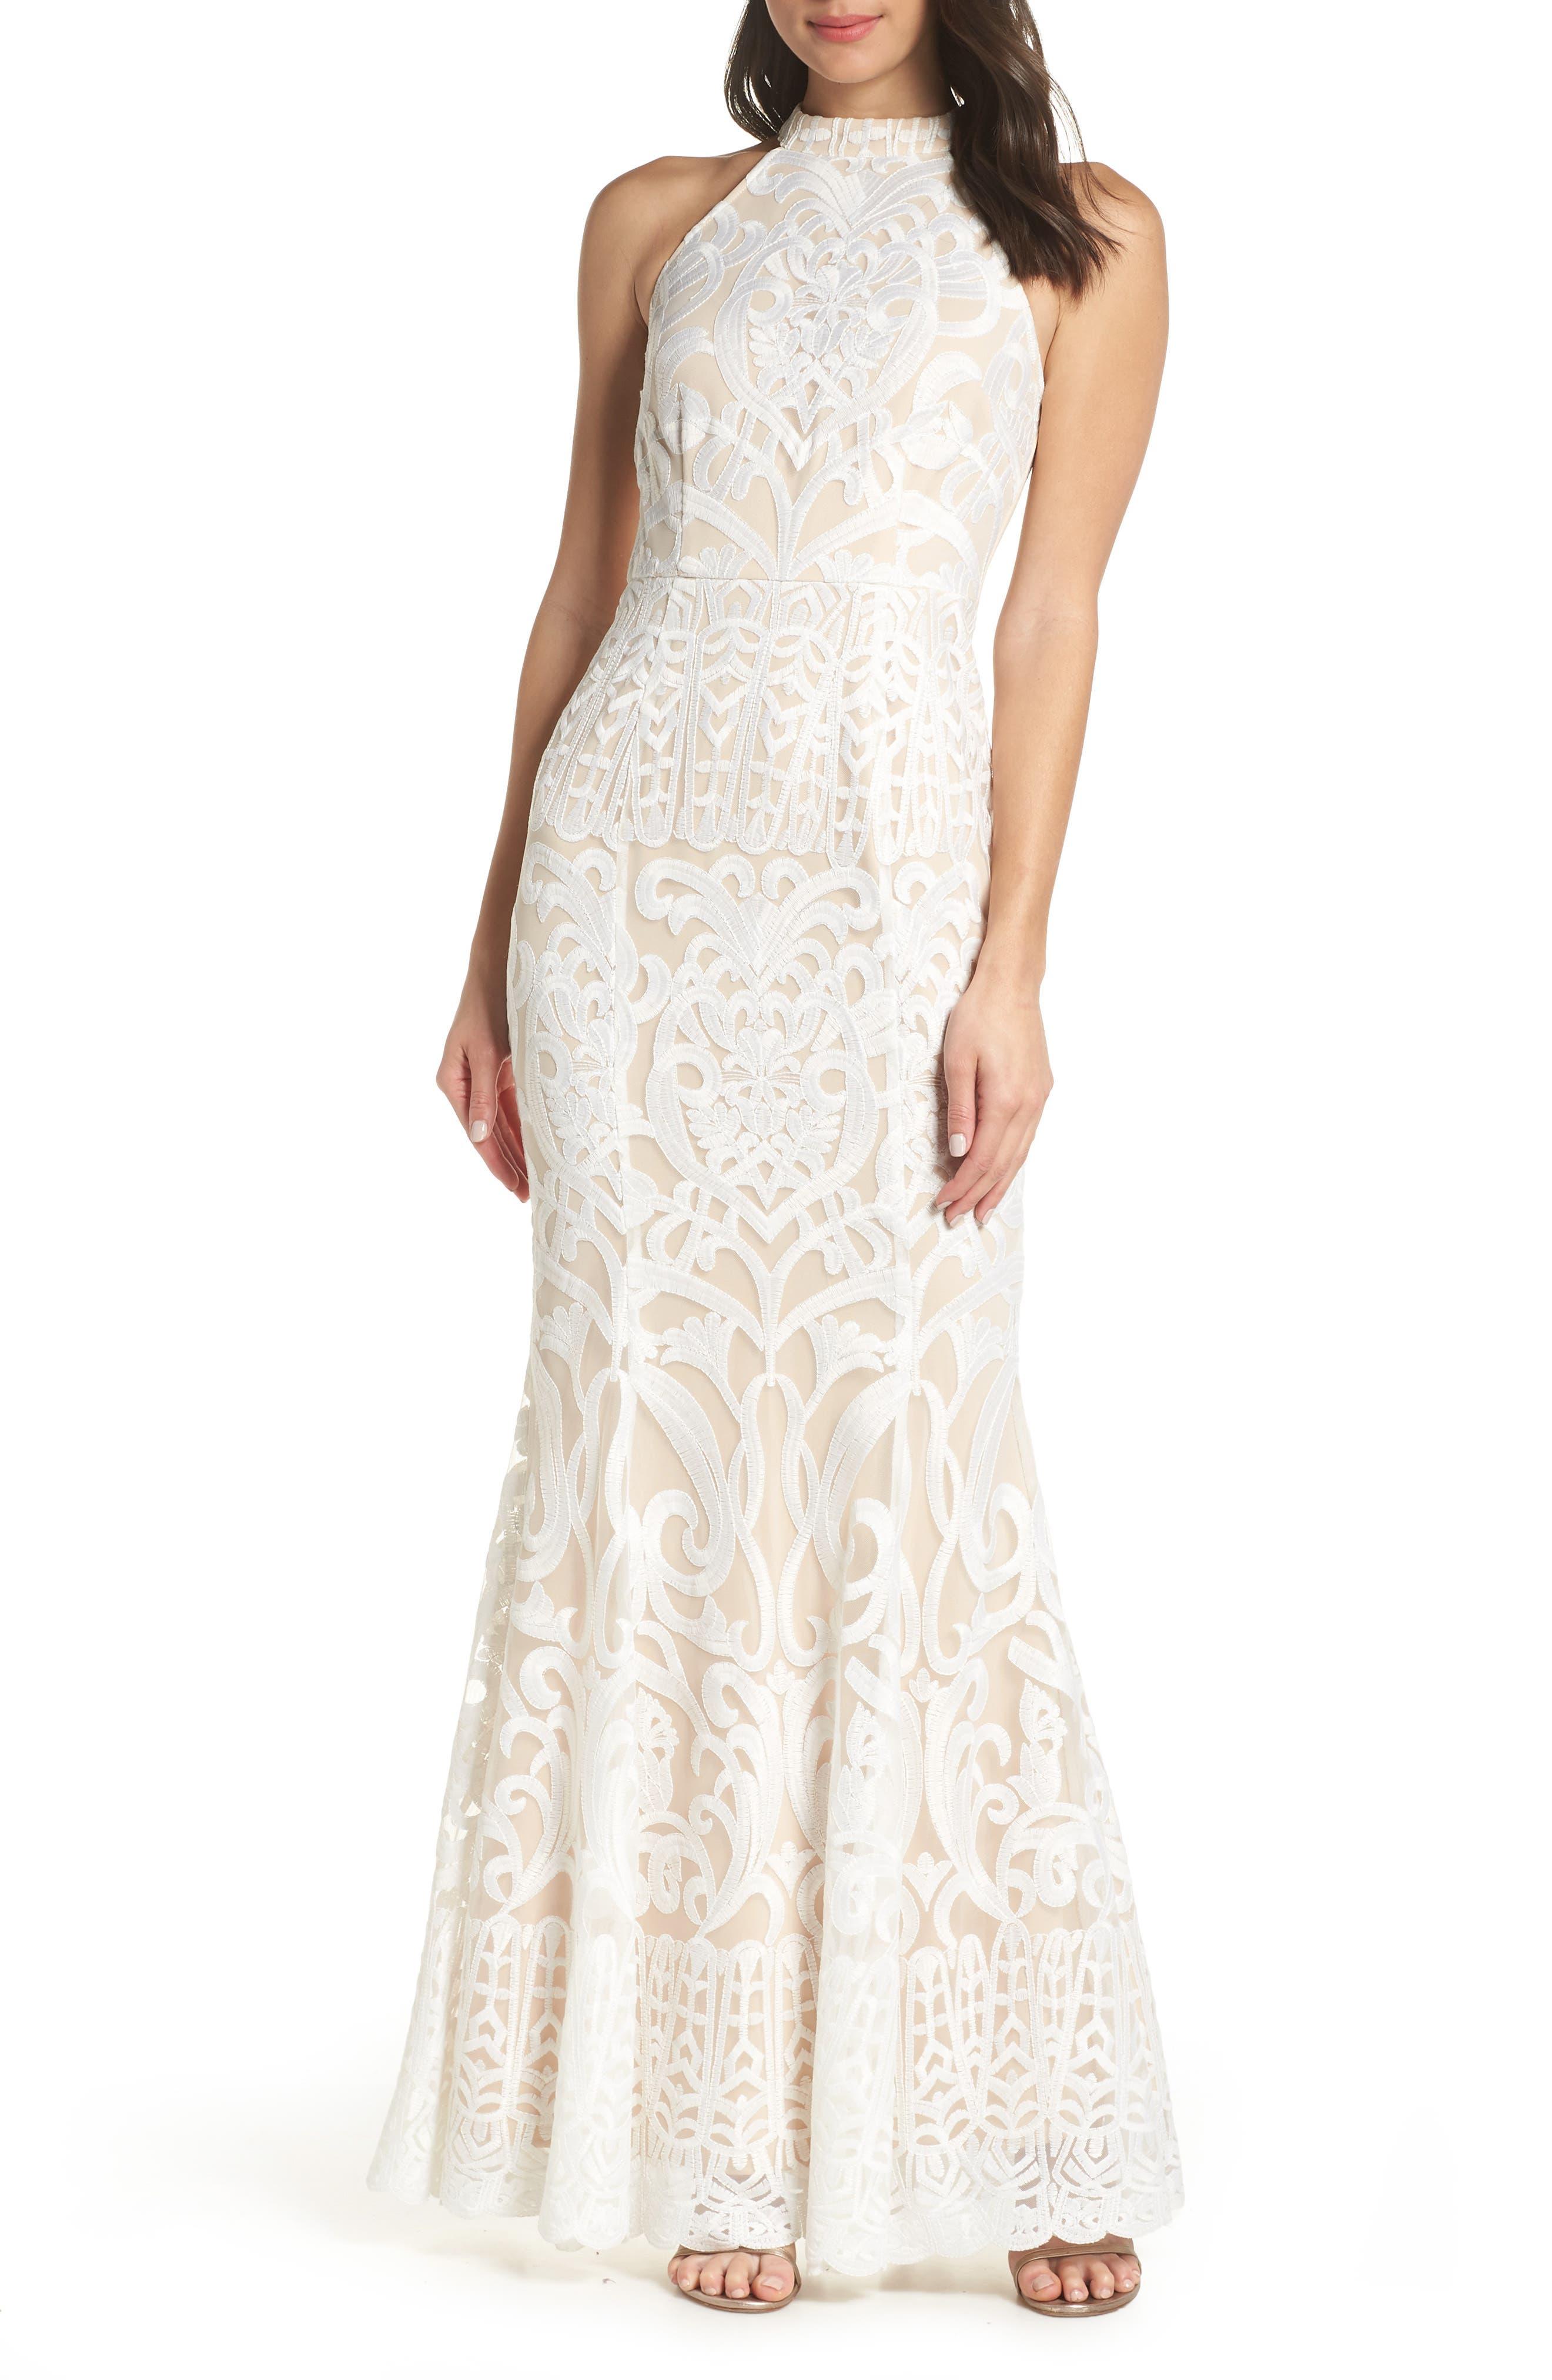 Foxiedox Alina Embroidered Halter Dress, Ivory